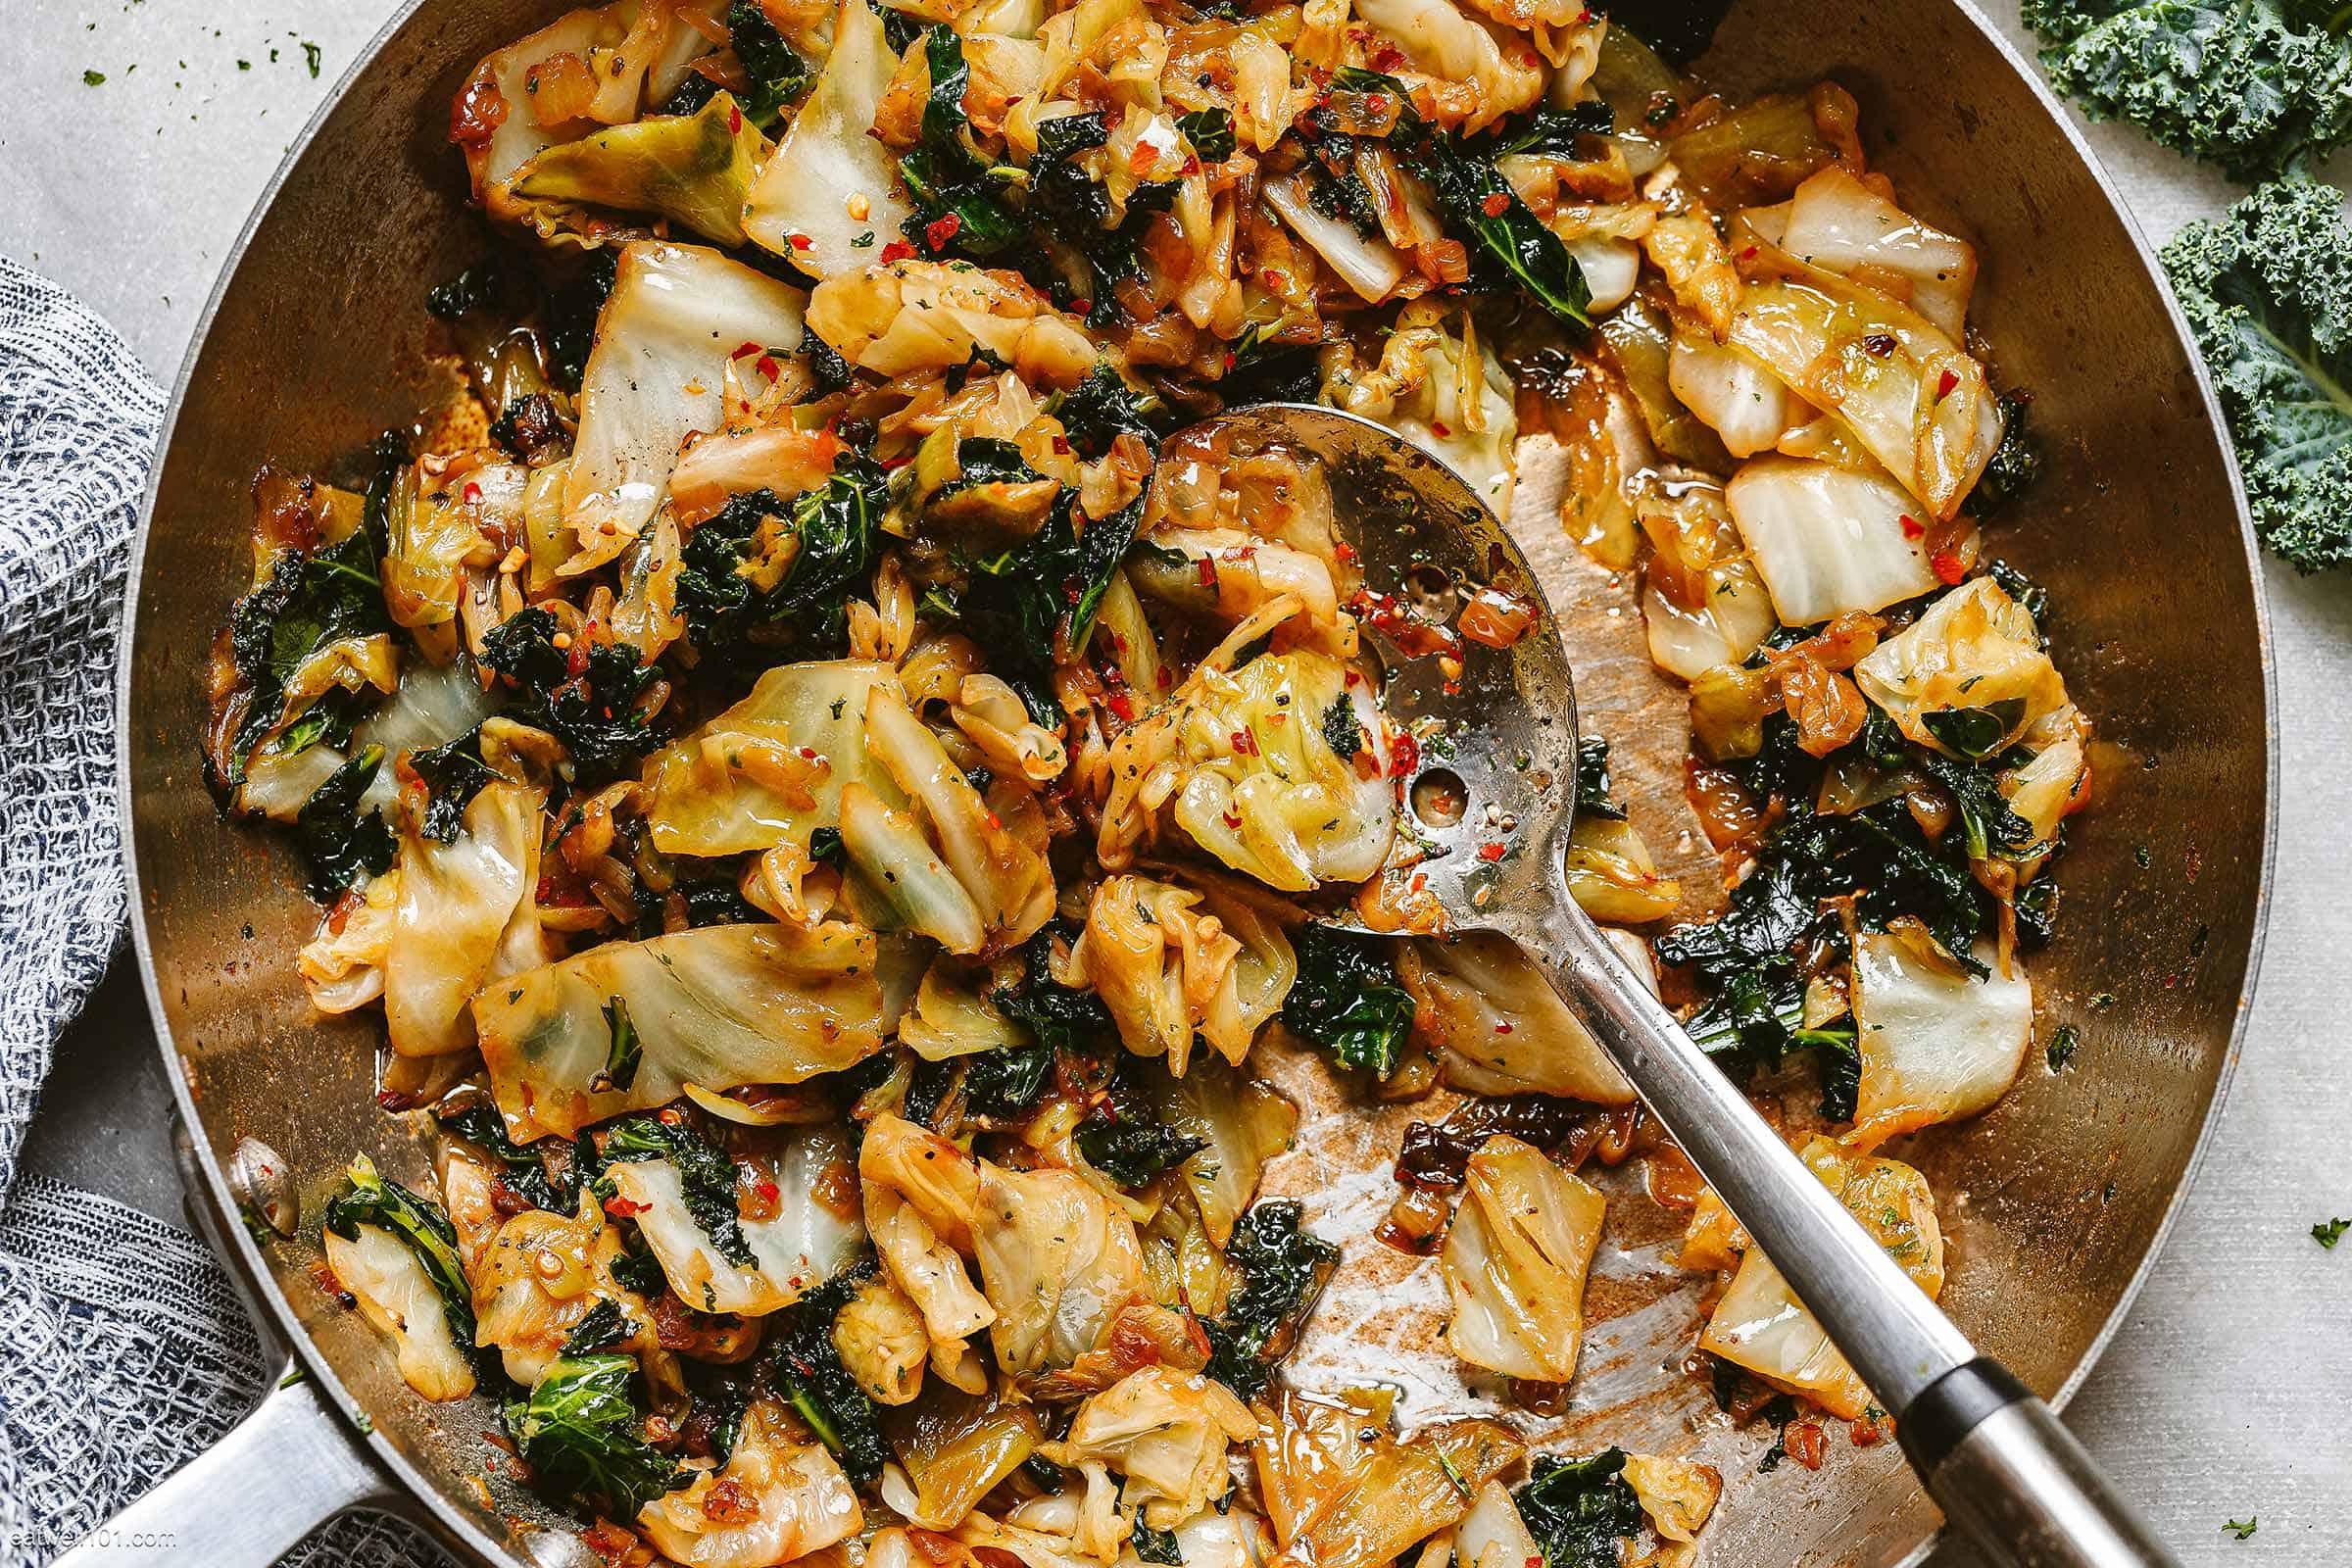 sauteed-kale-cabbage-recipe